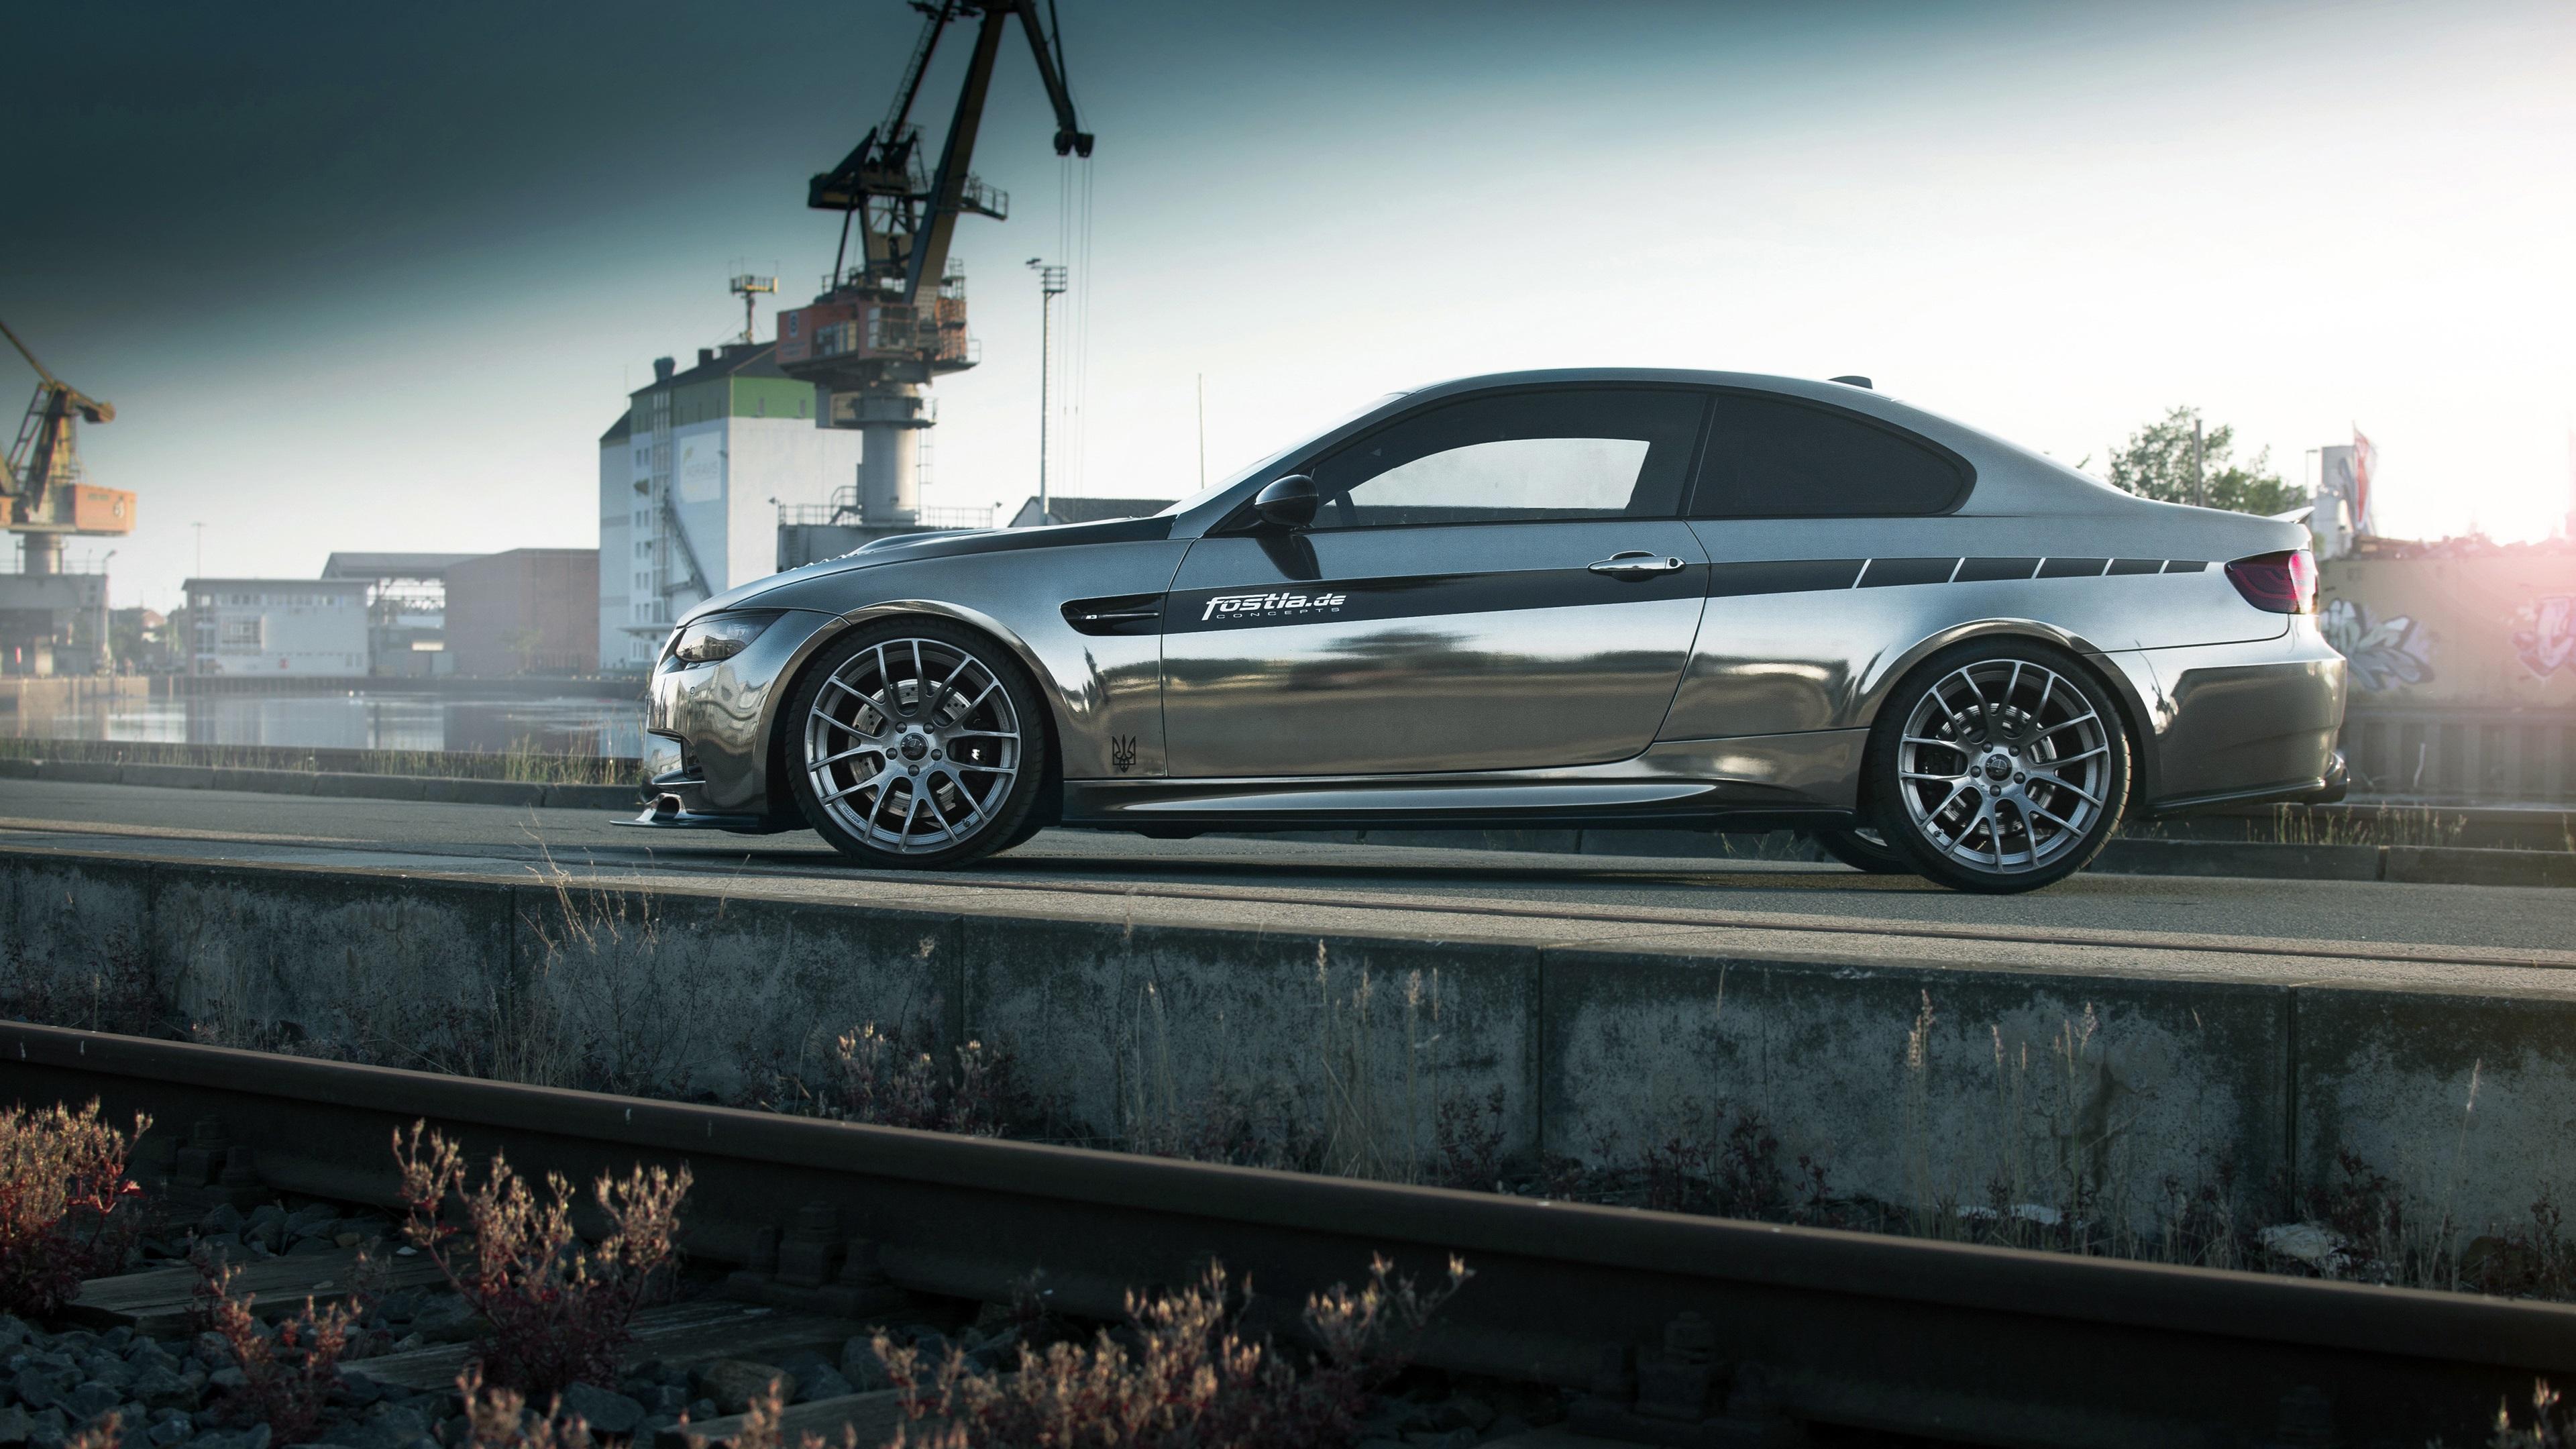 Wallpaper Fostla BMW M3 E92 Coupe Side View 3840x2160 UHD 4K Picture